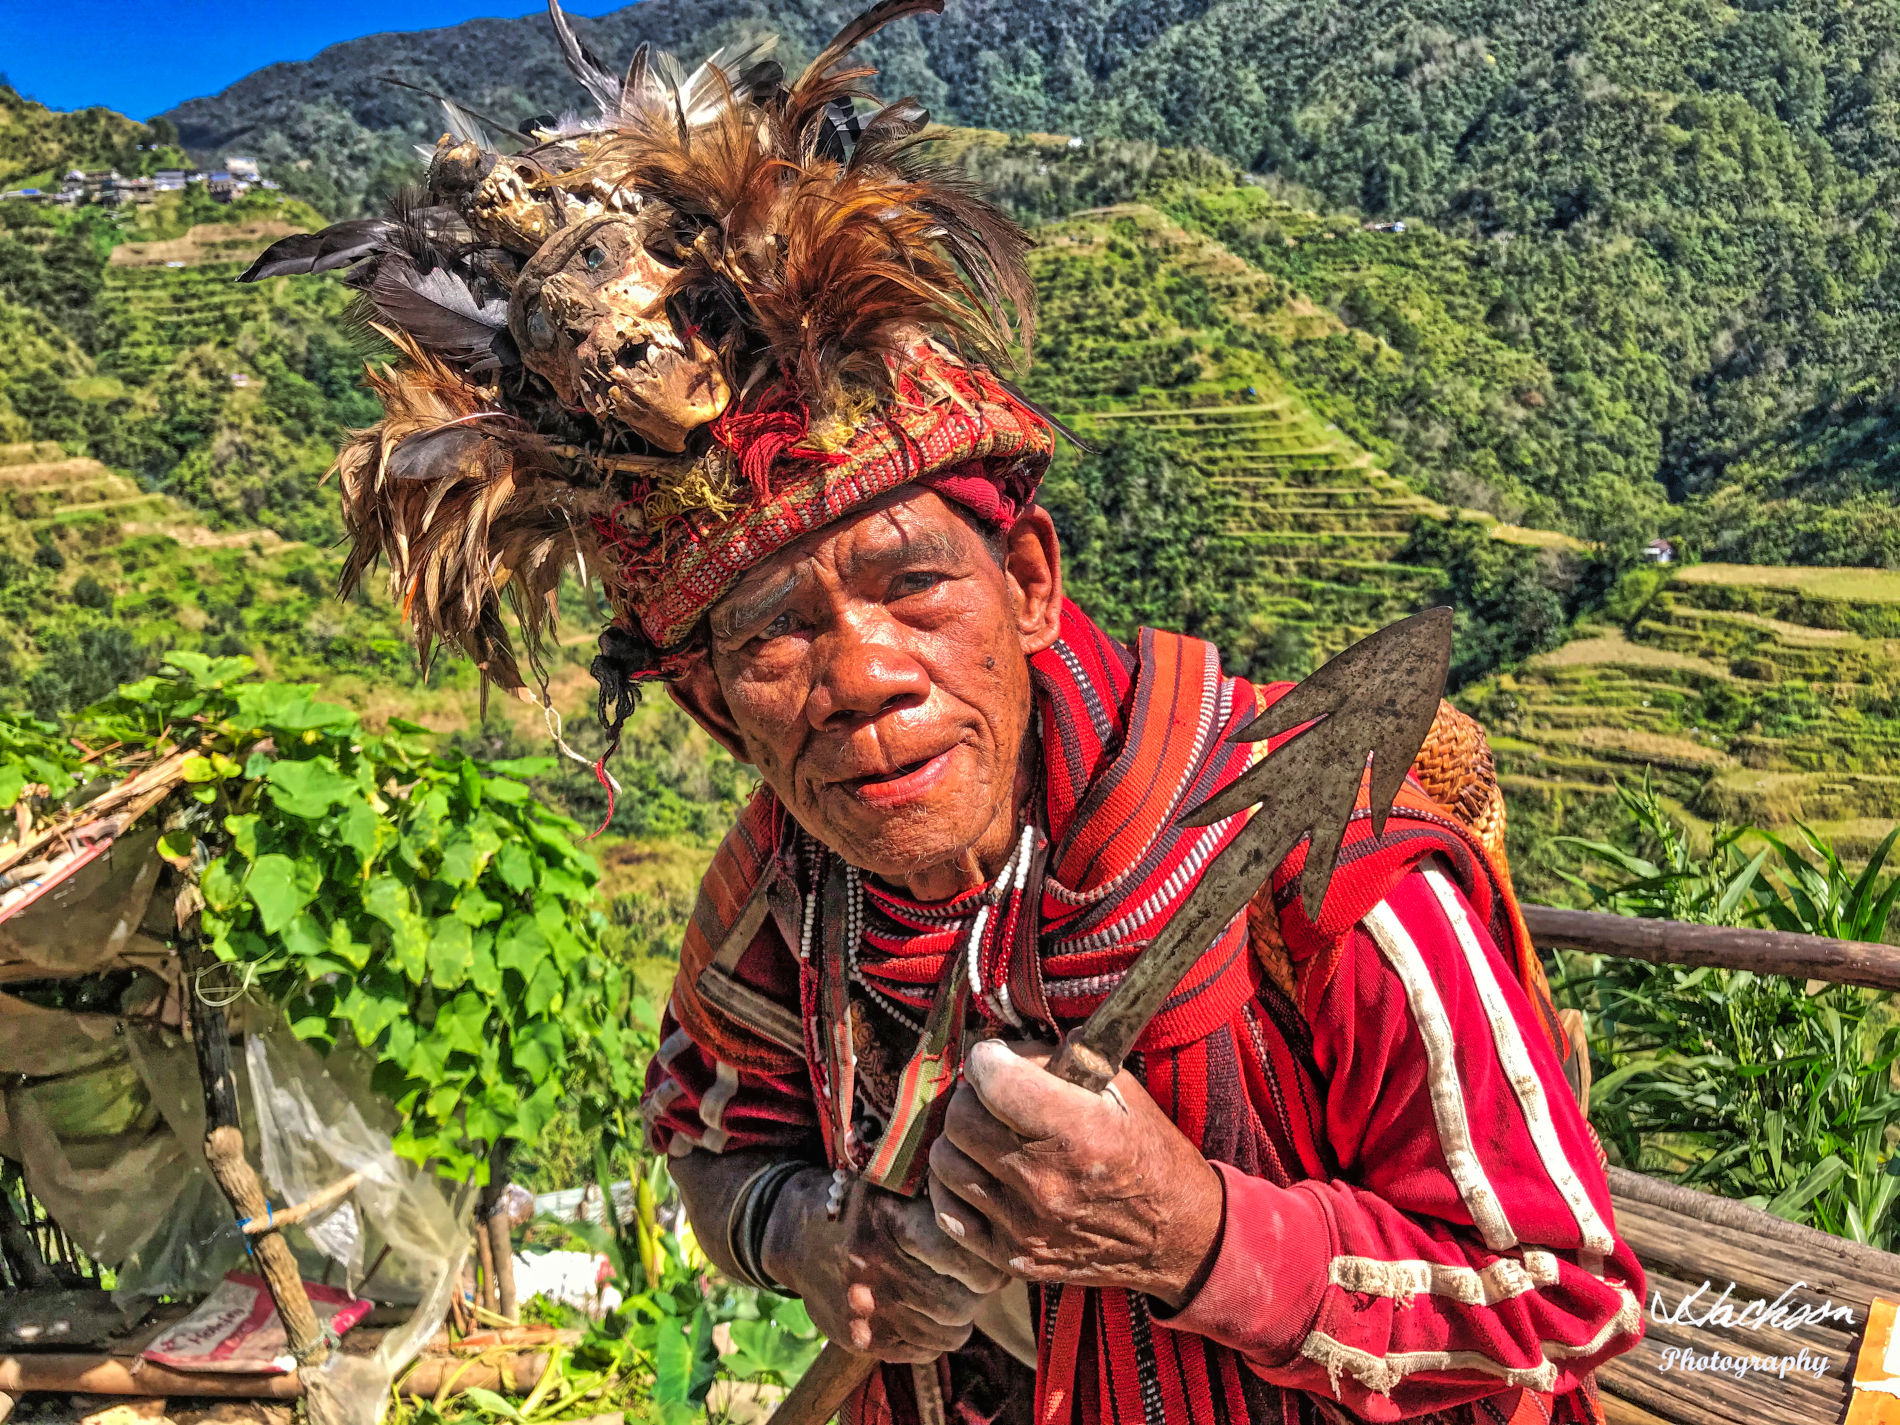 Photo of Ifugao warrior